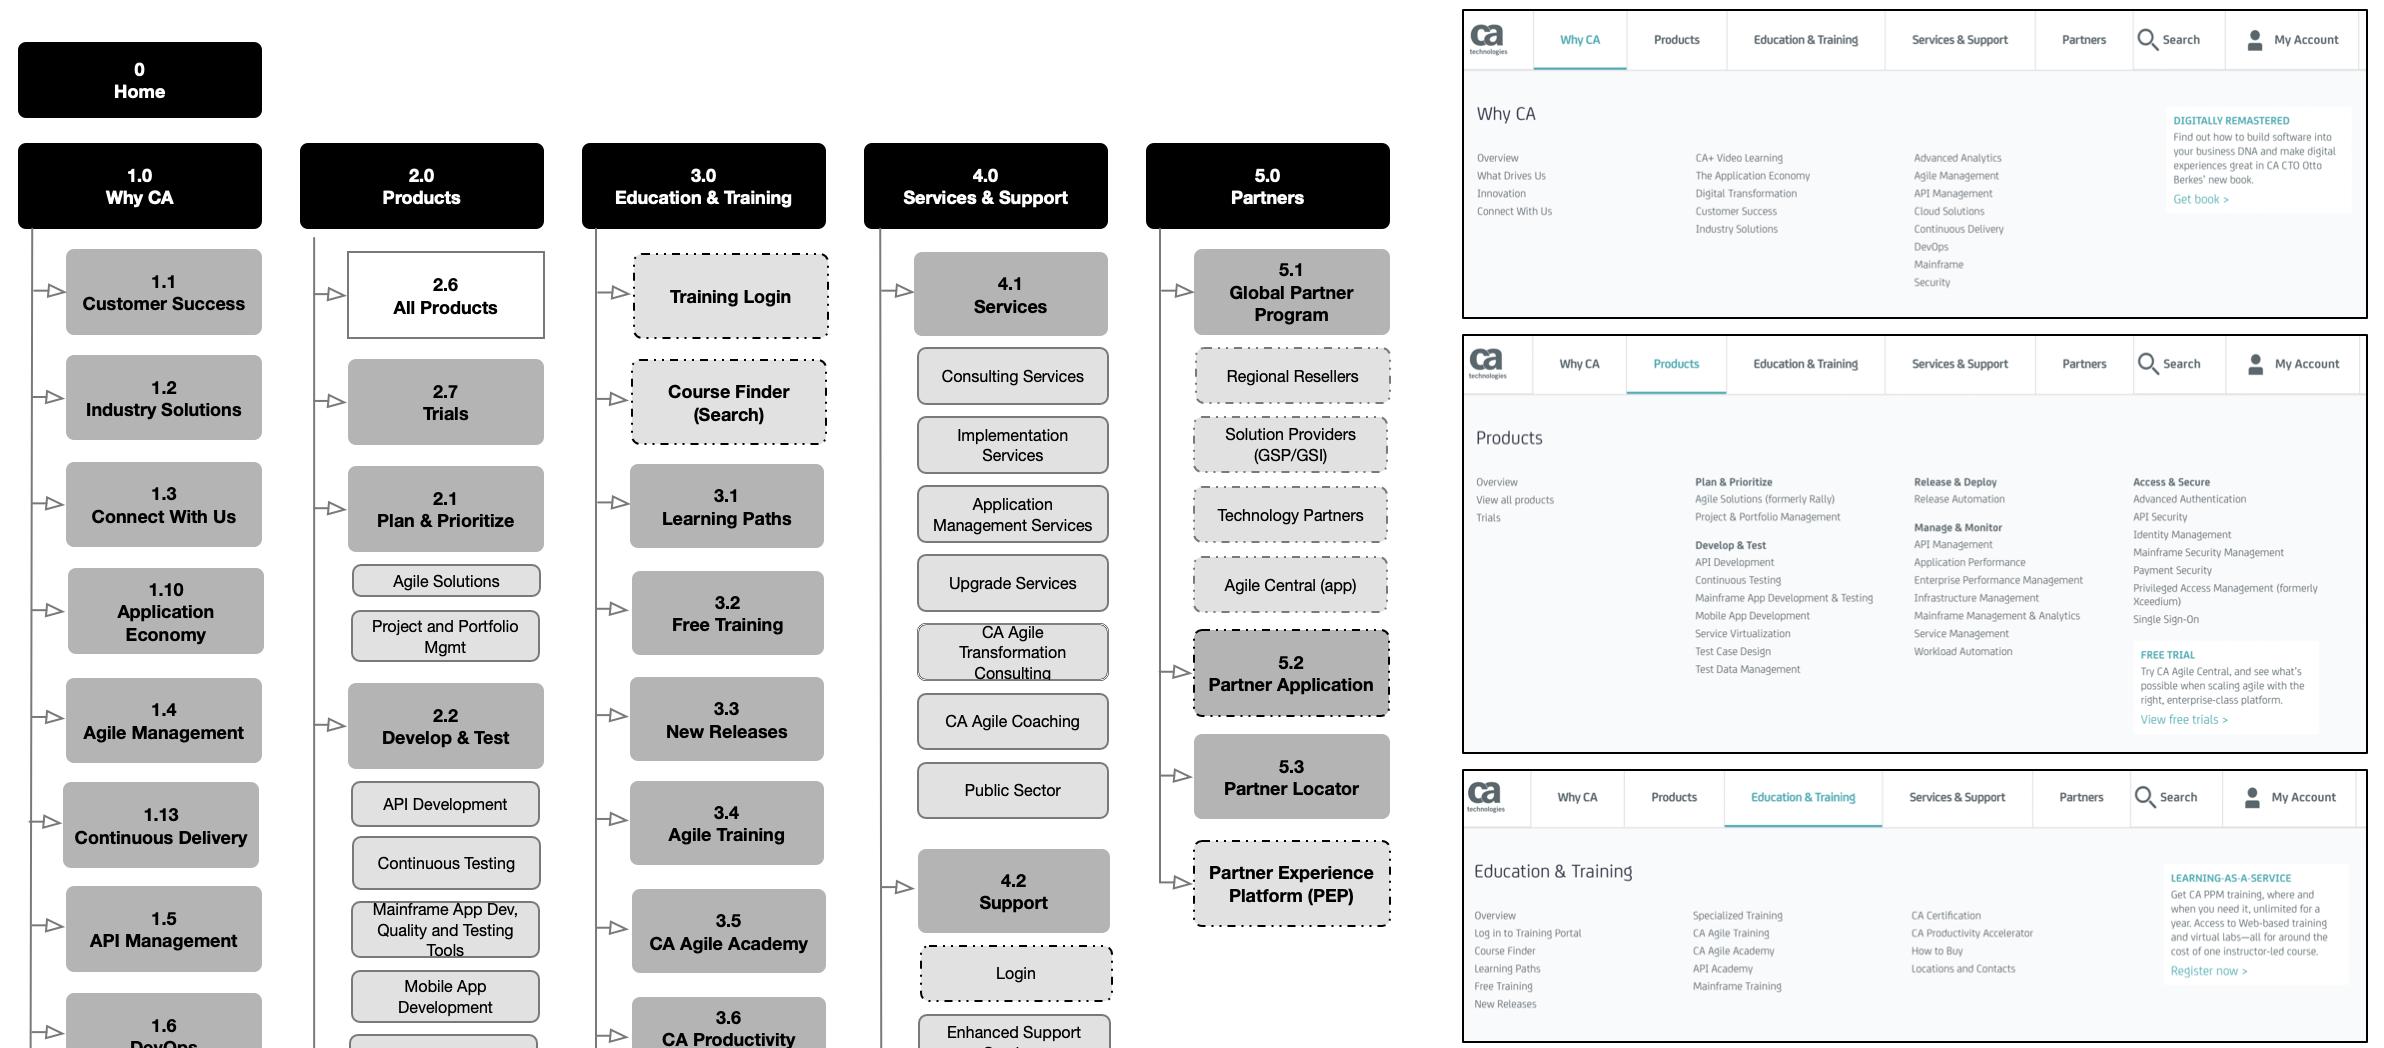 Basic IA with references to navigation panels.